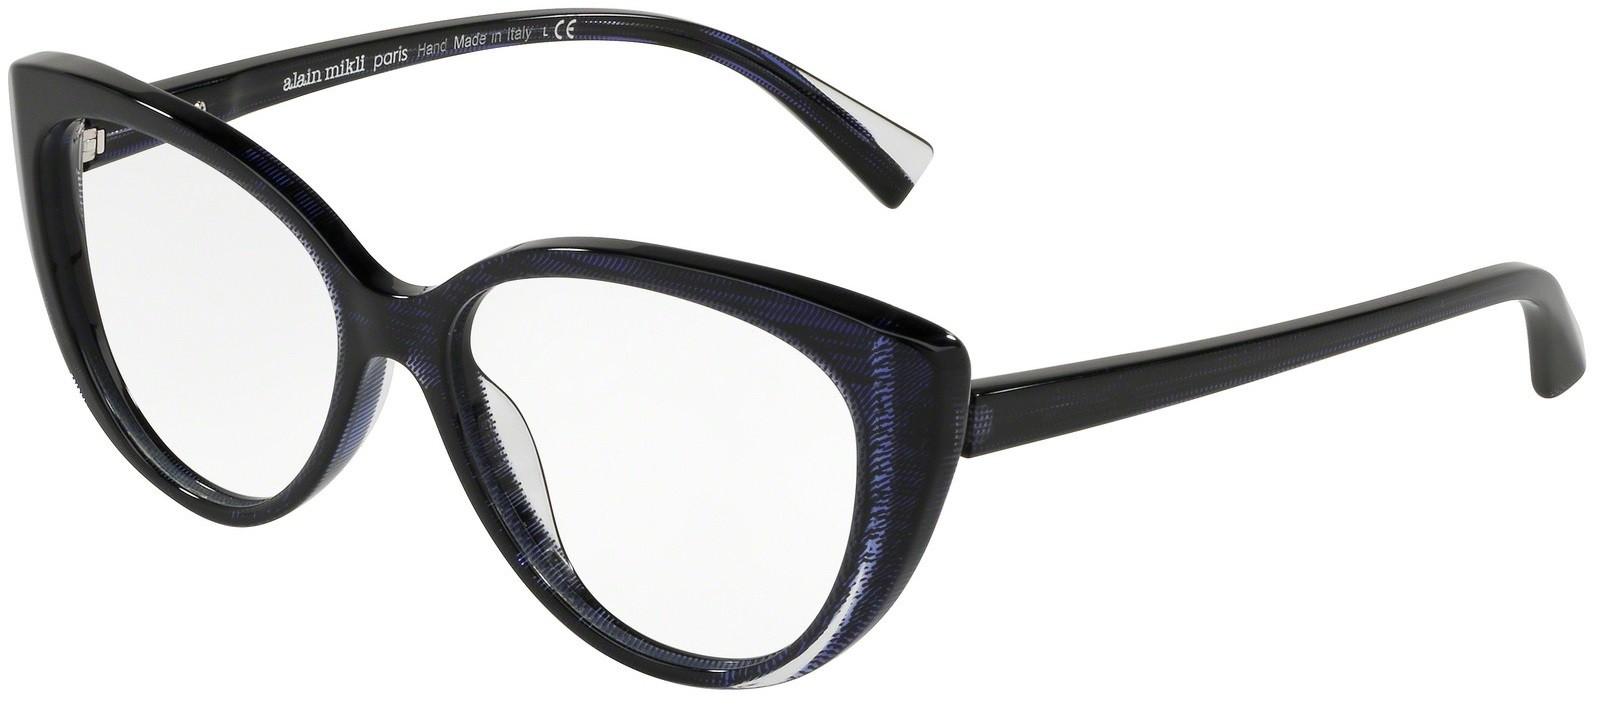 612c254a15024 Alain Mikli 3084 005 - Oculos de Grau